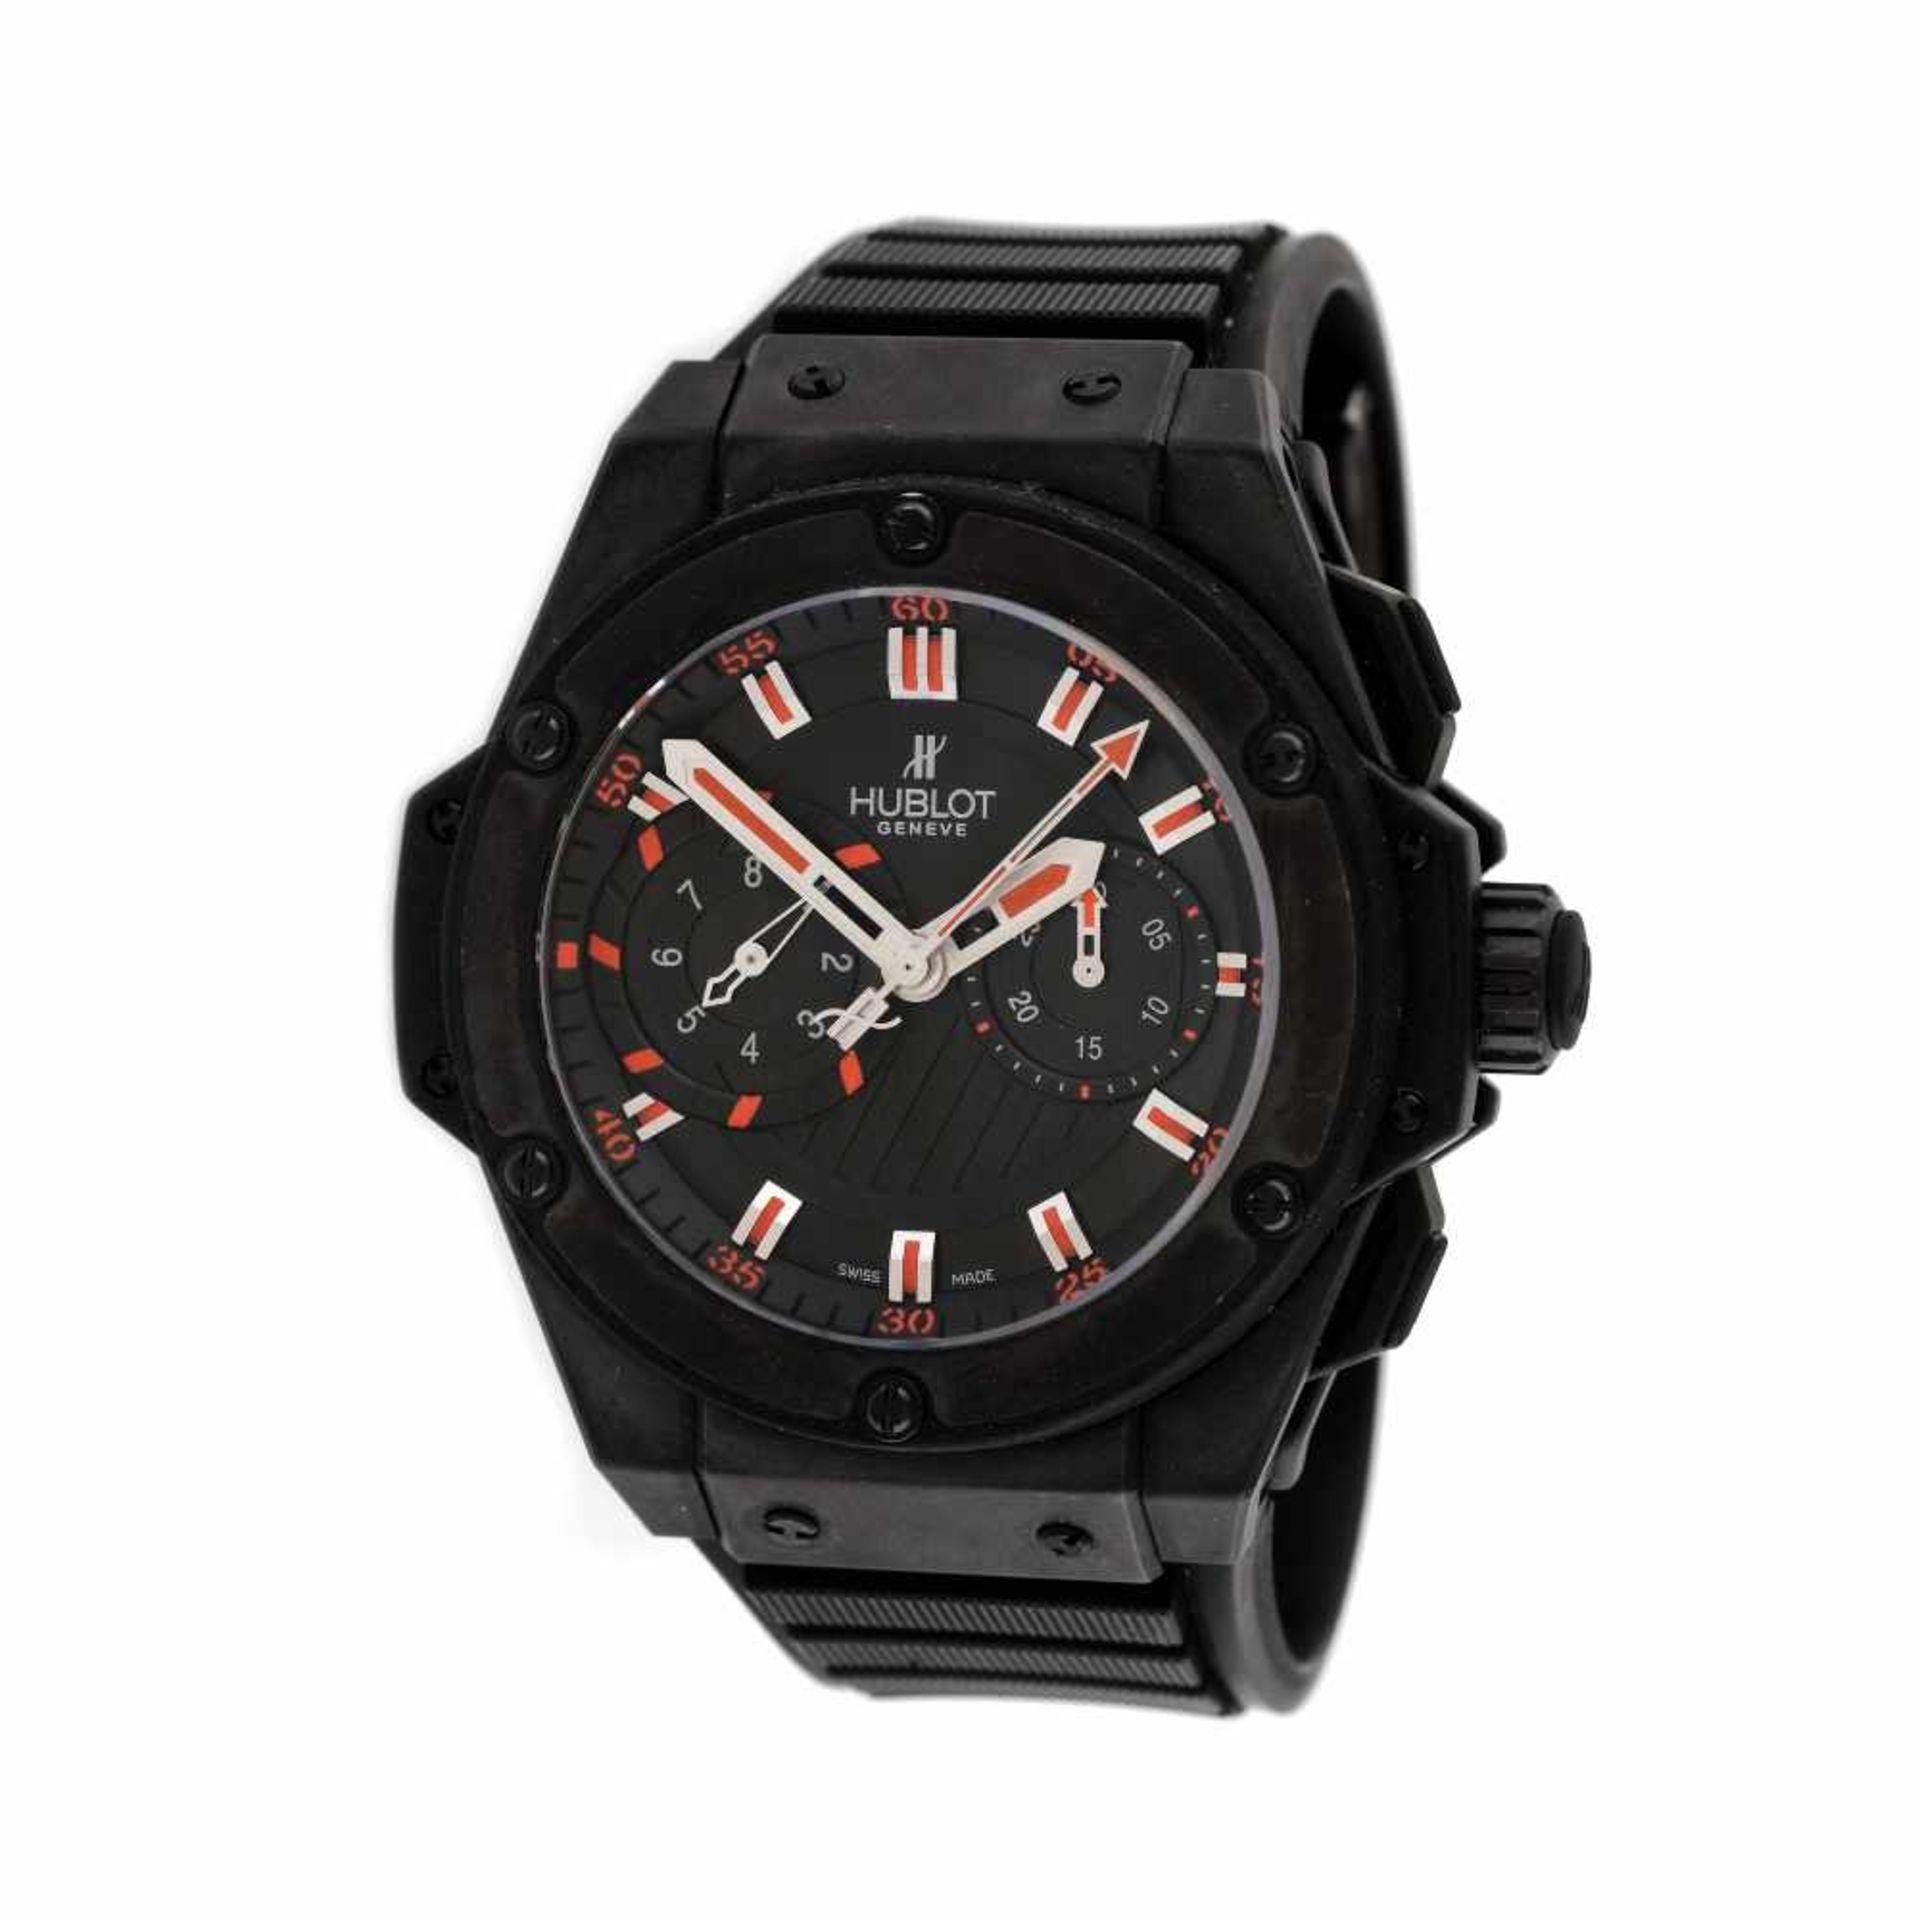 Hublot King Power wristwatch, ceramic, men, limited edition 301/500, provenance documents